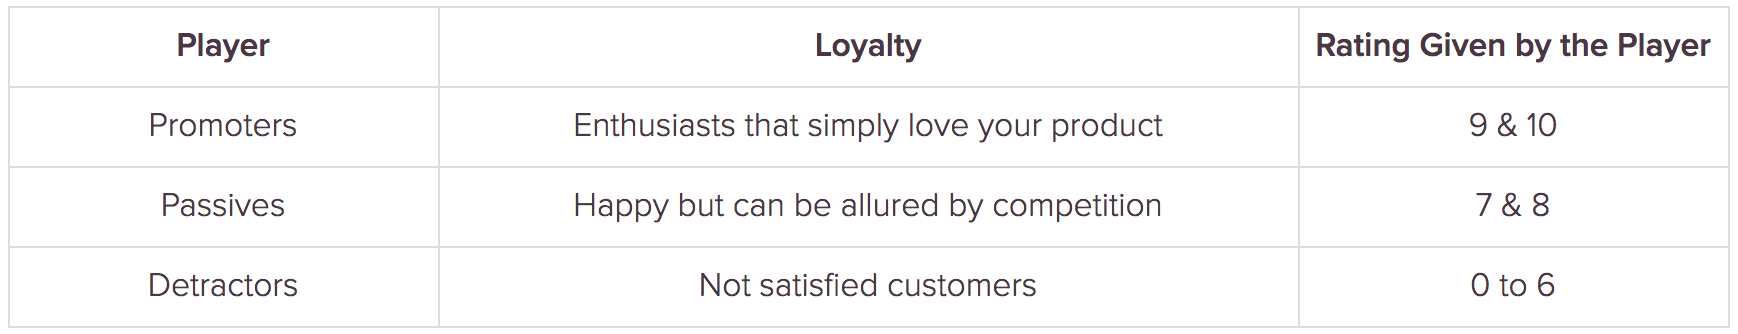 Net Promoter Score measures brand loyalty